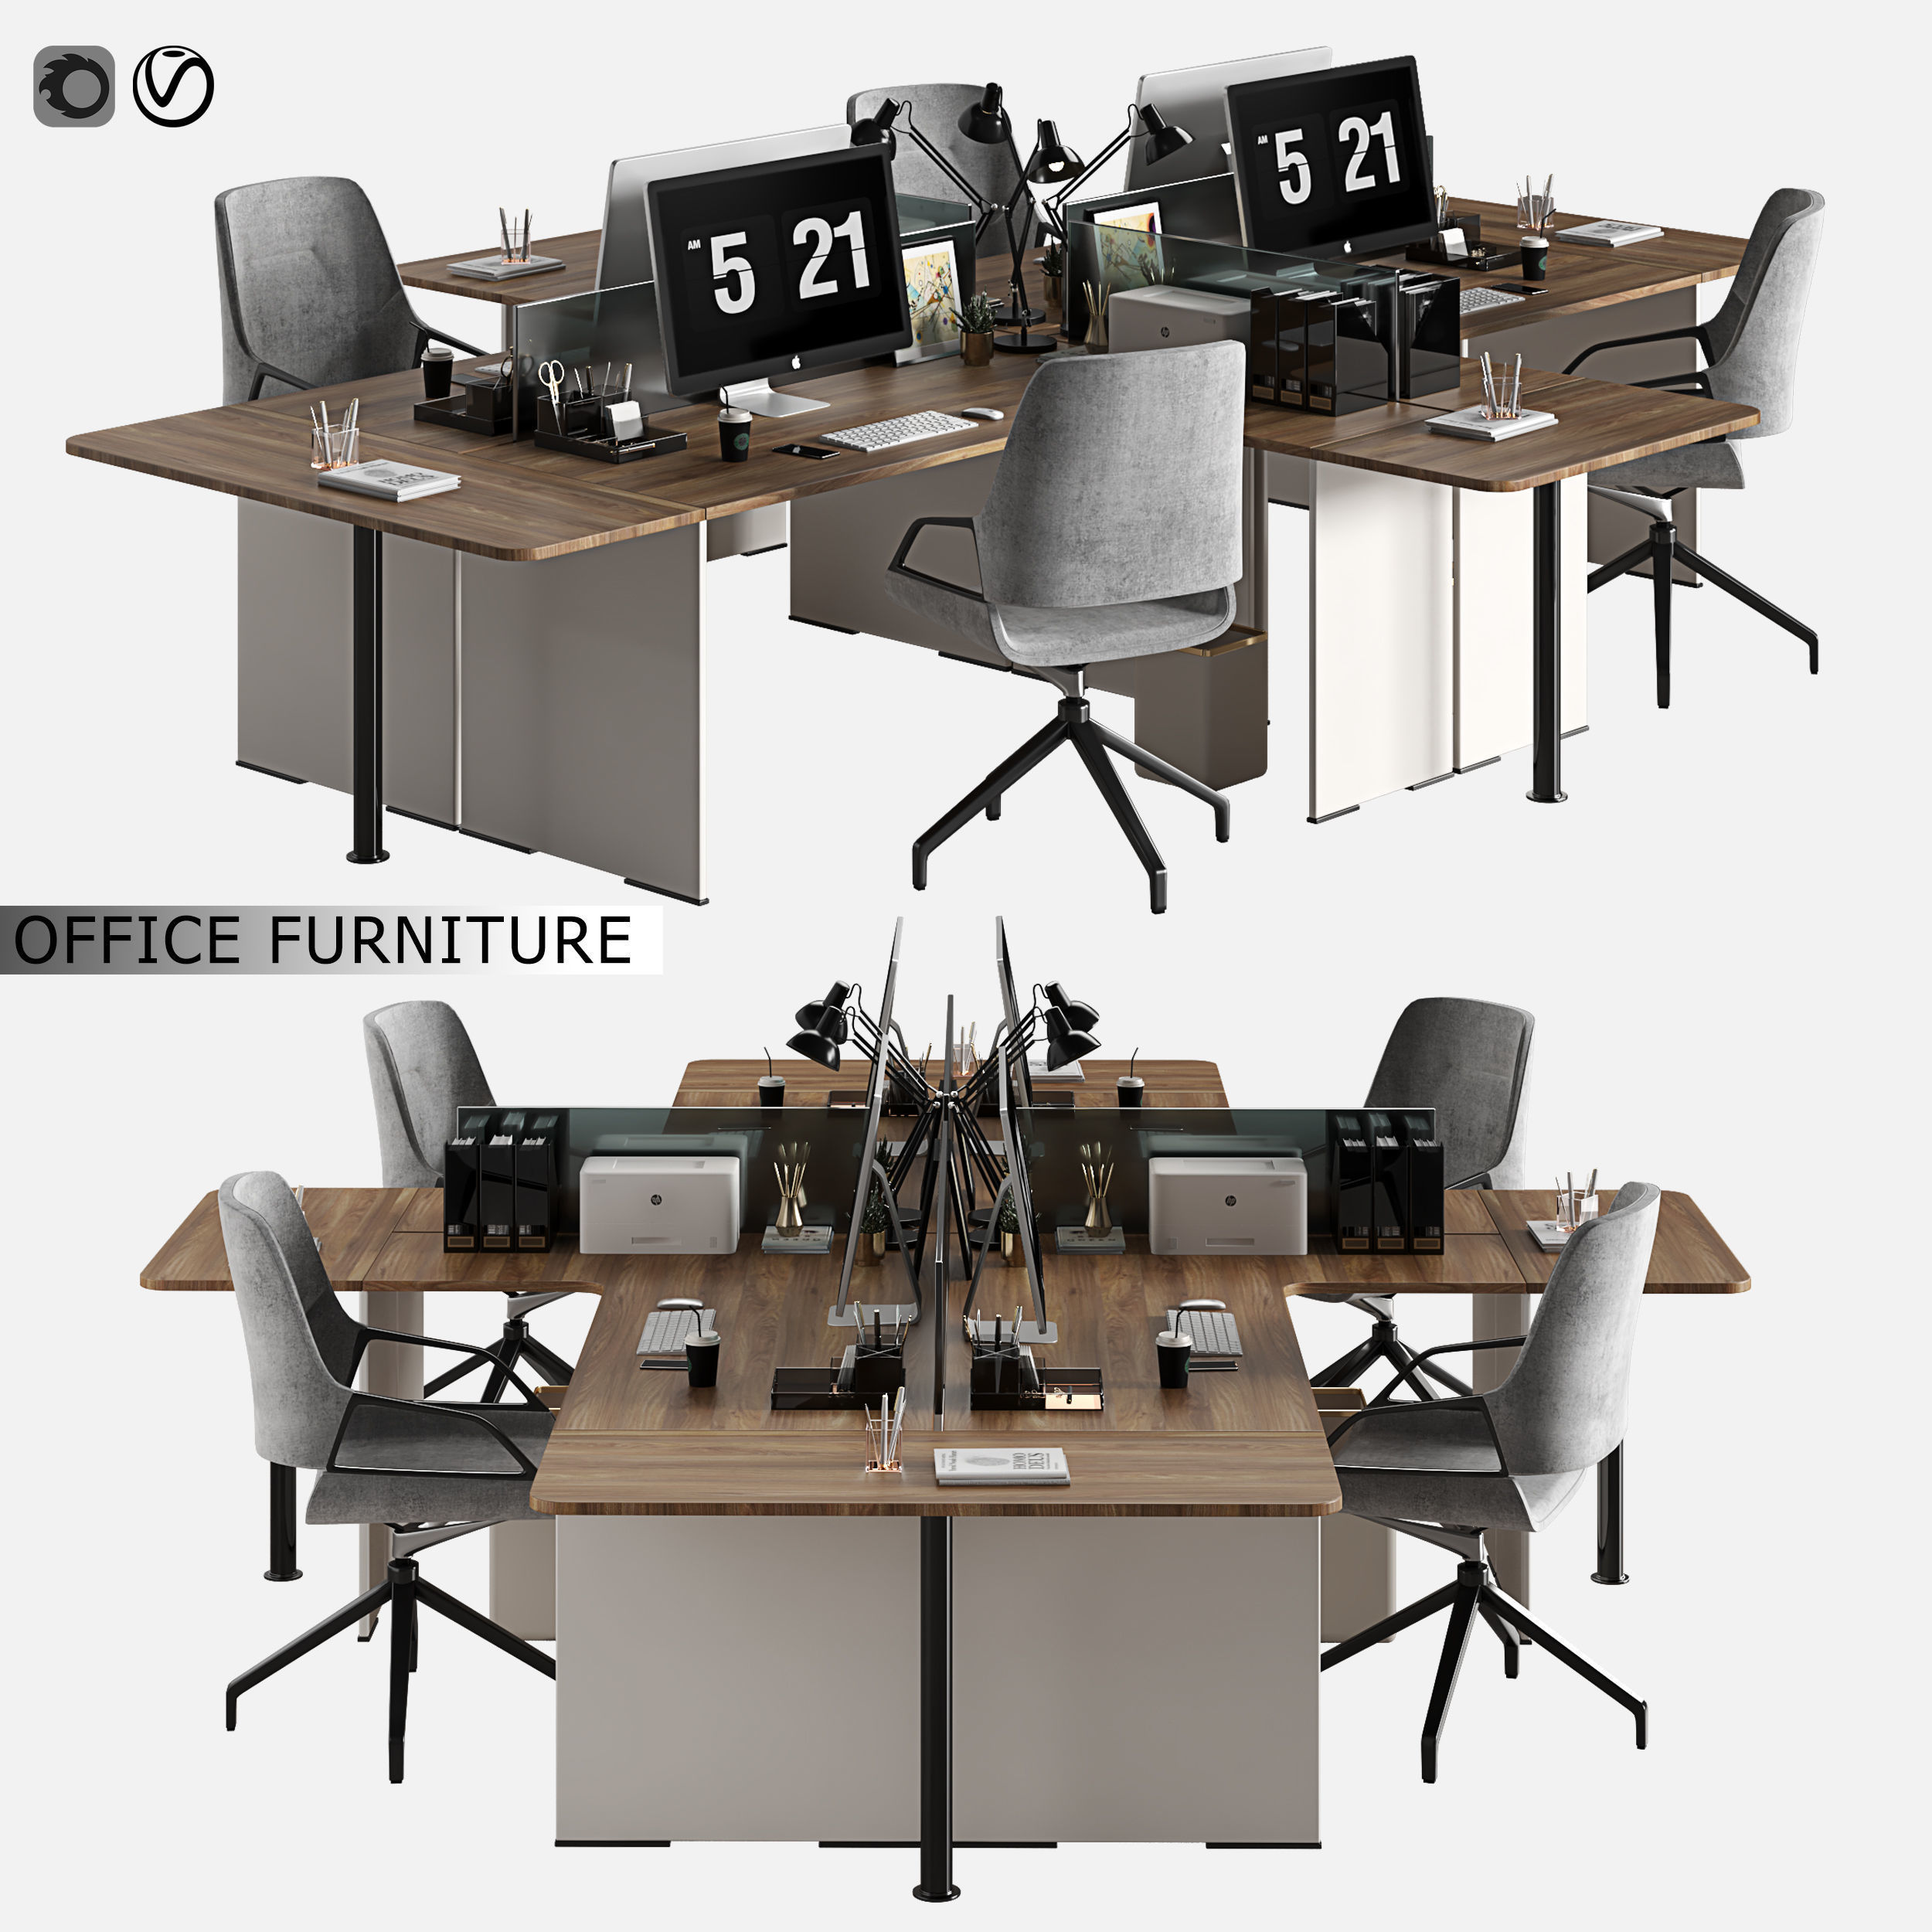 office furniture 07